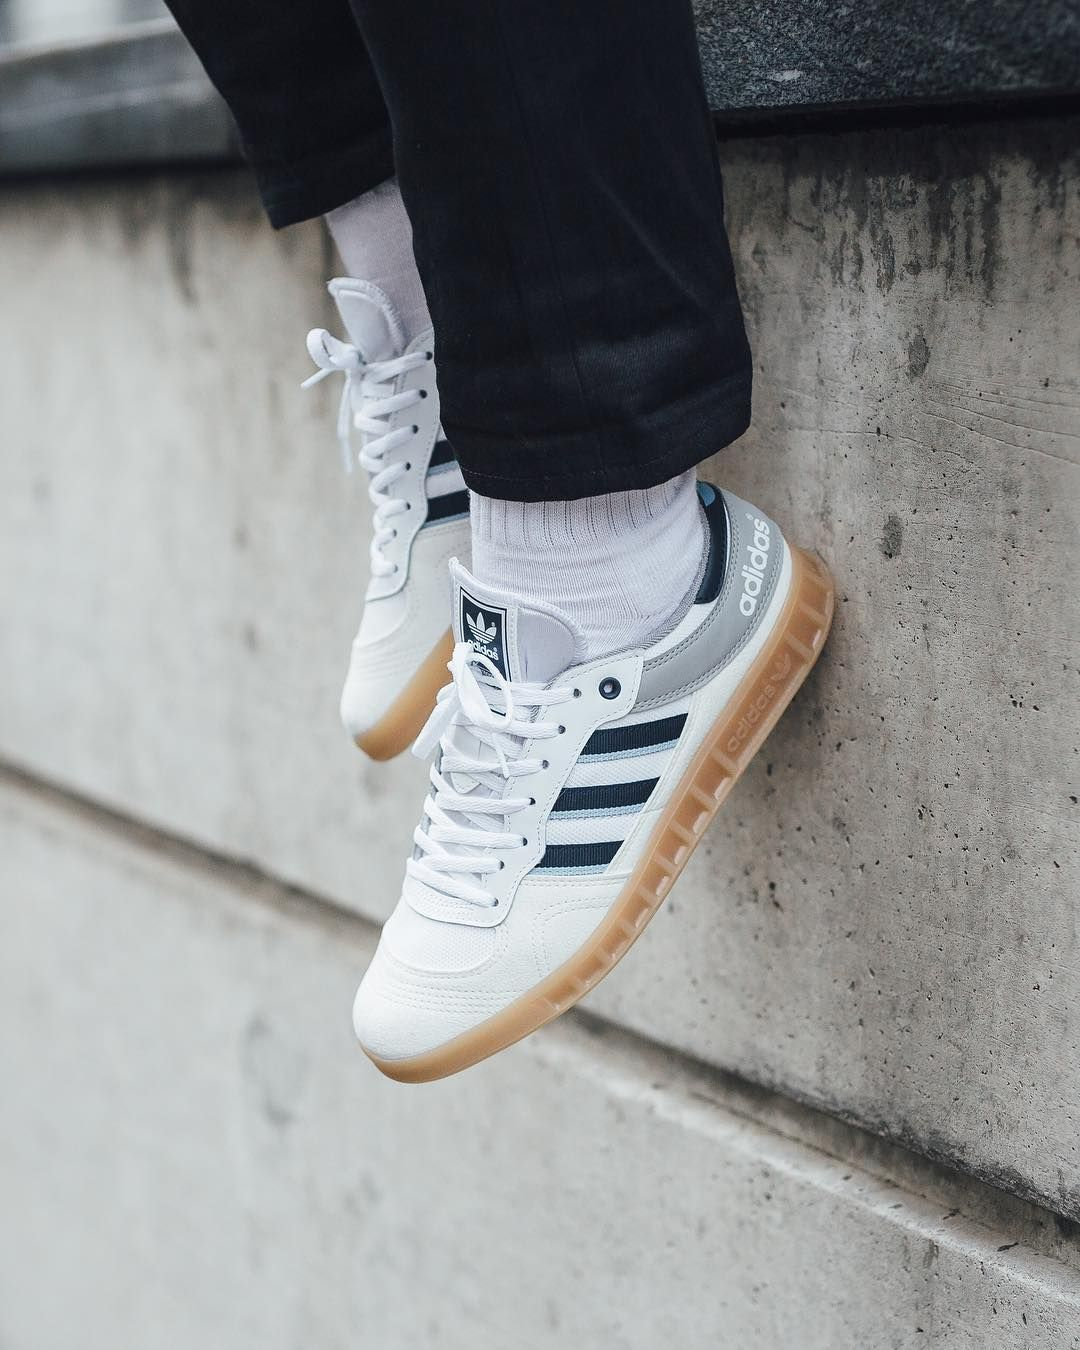 Sneaker boutique, Sneakers, Adidas sneakers